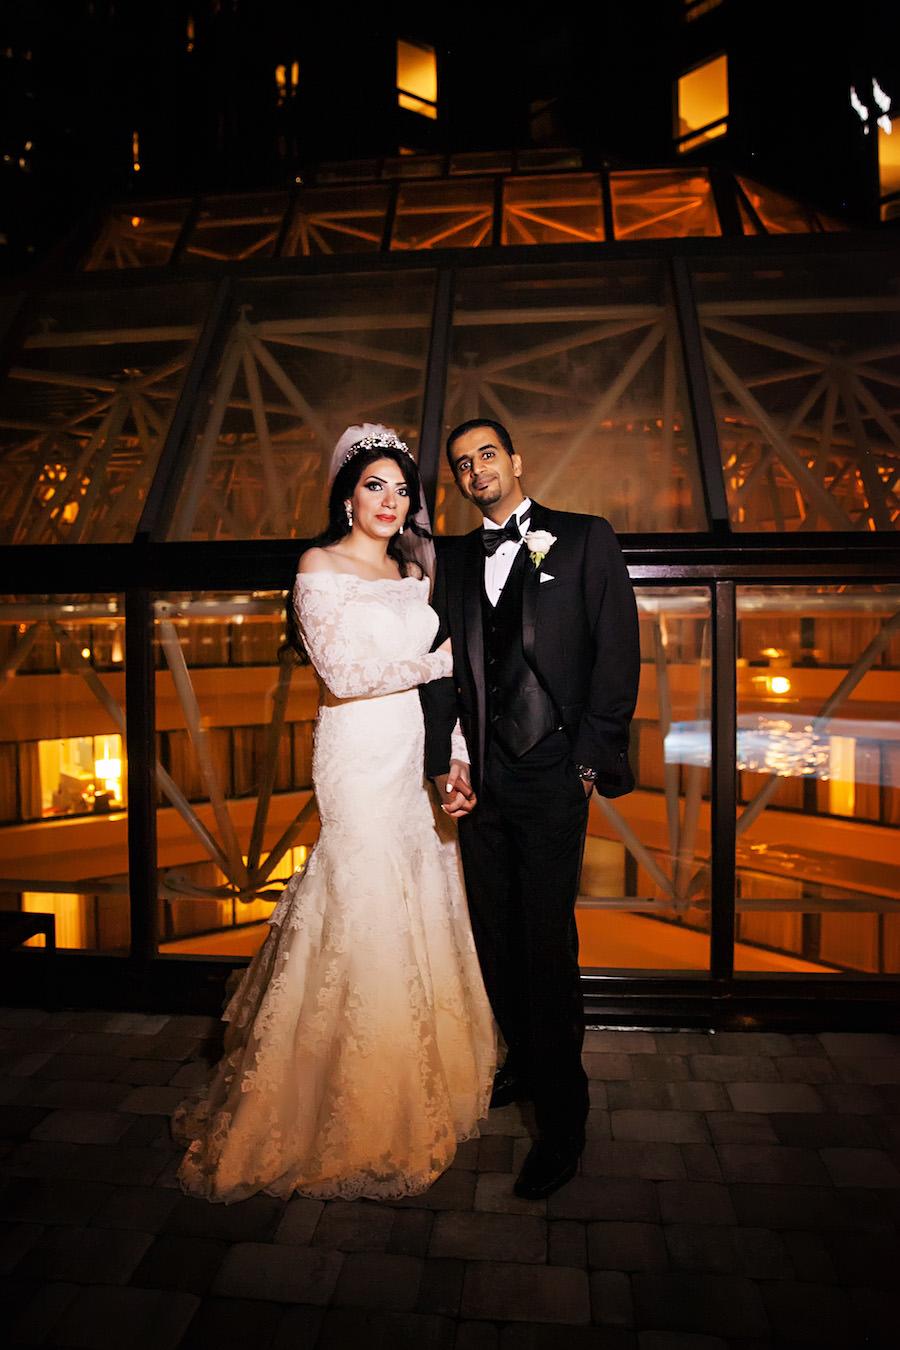 Elegant Nighttime Indian Bride and Groom Wedding Portrait | Downtown Tampa Hotel Wedding Venue Hilton Downtown | Wedding Photographer Limelight Photography